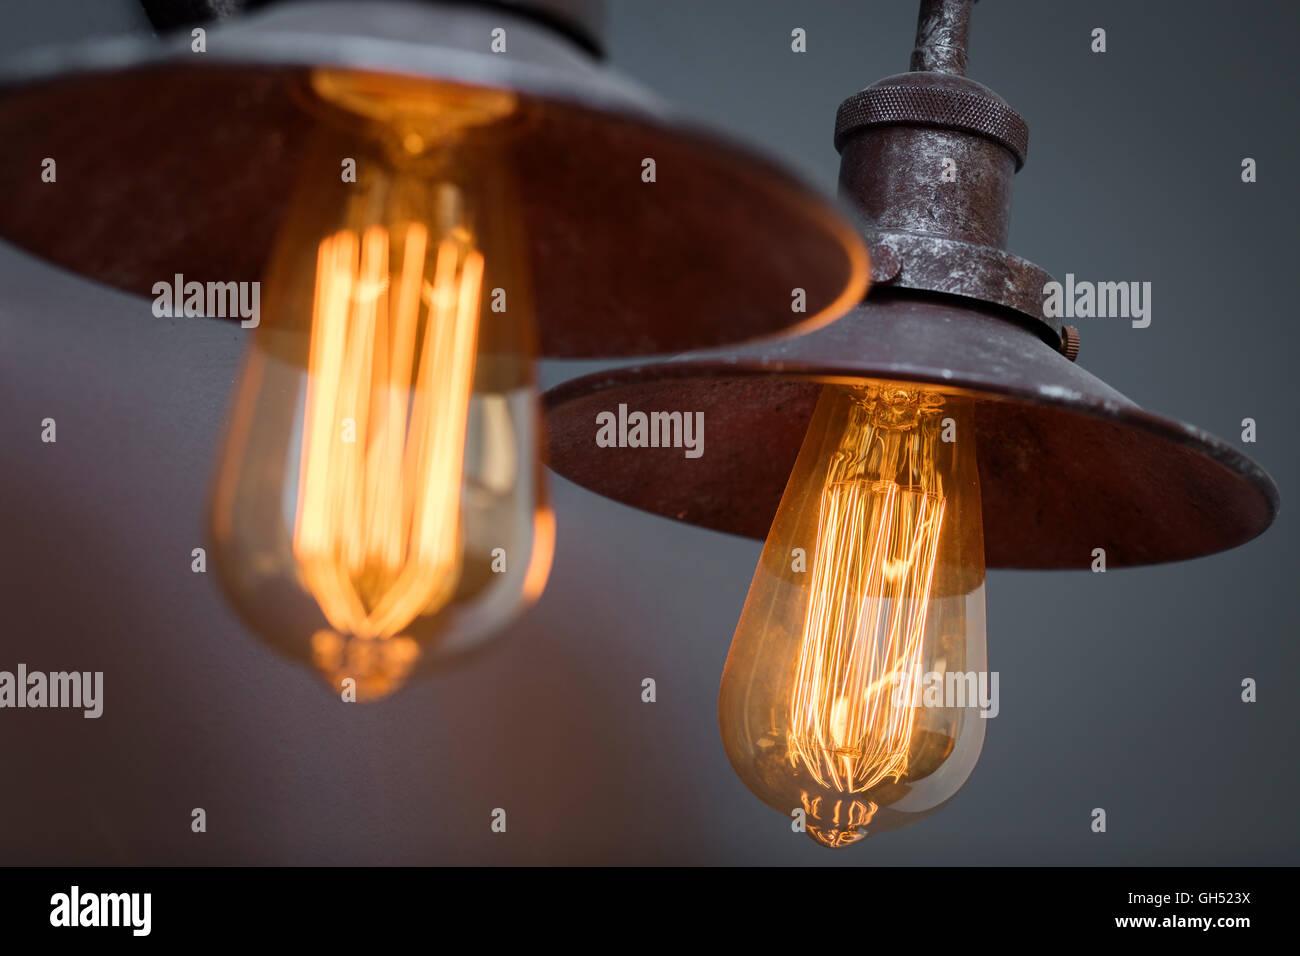 Light Fitting - Stock Image